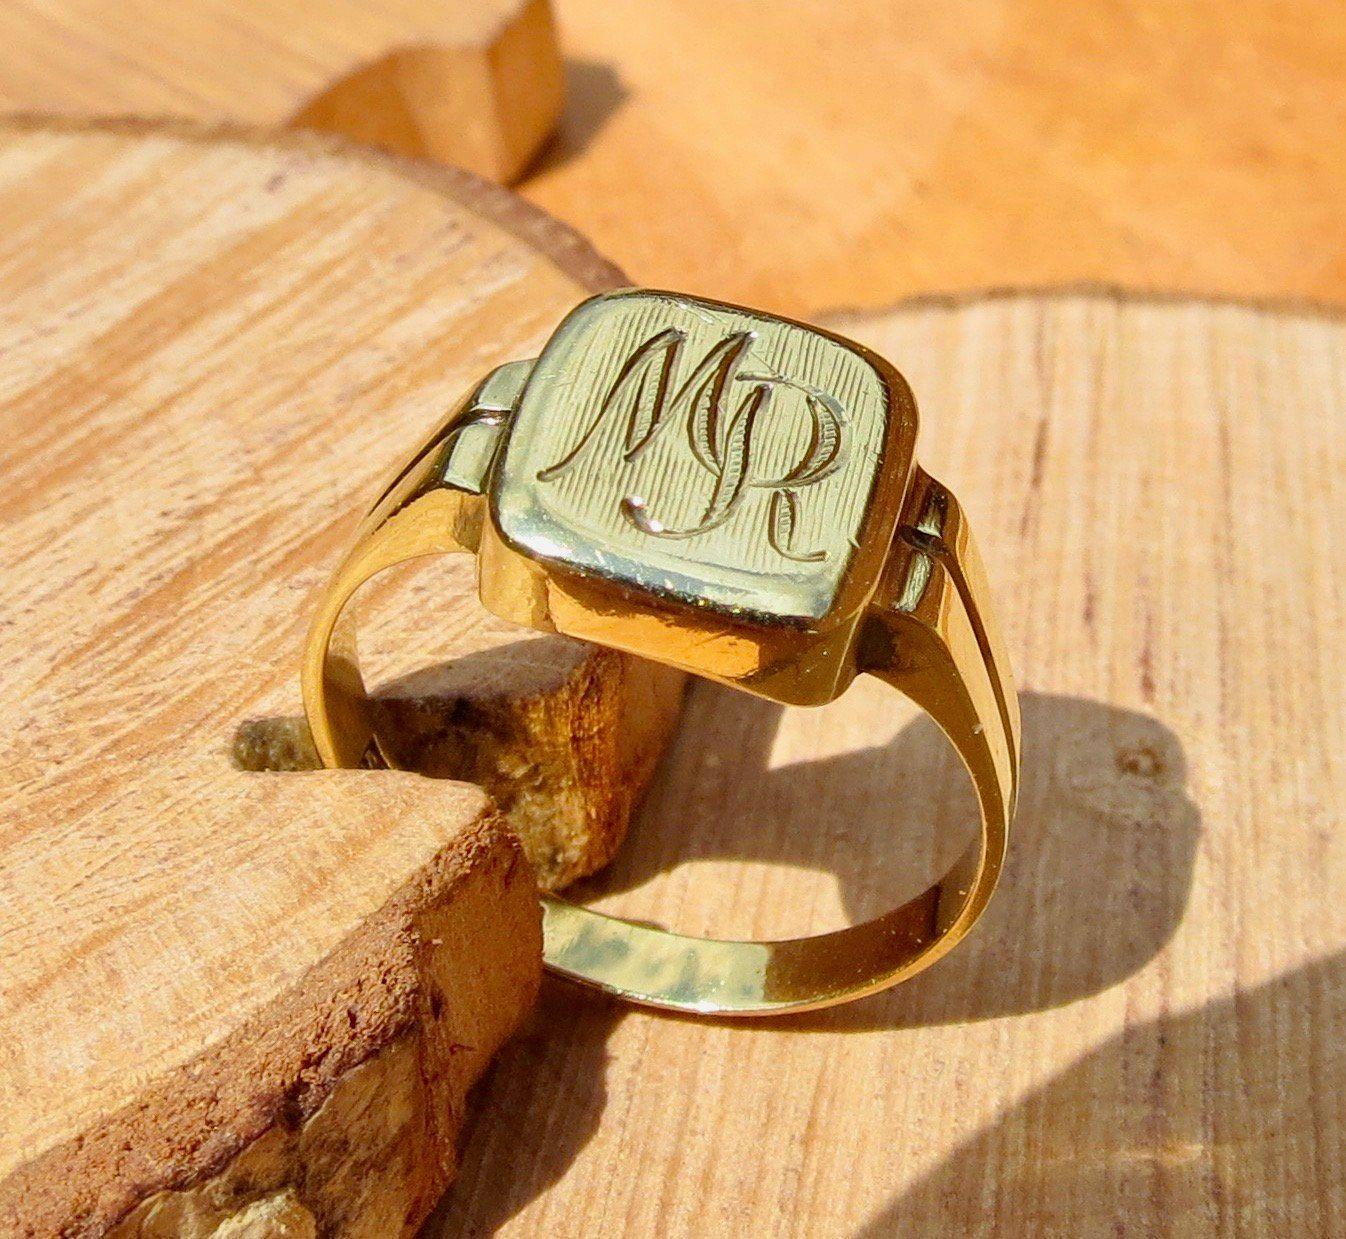 14K yellow gold engraved ring ring, Gold